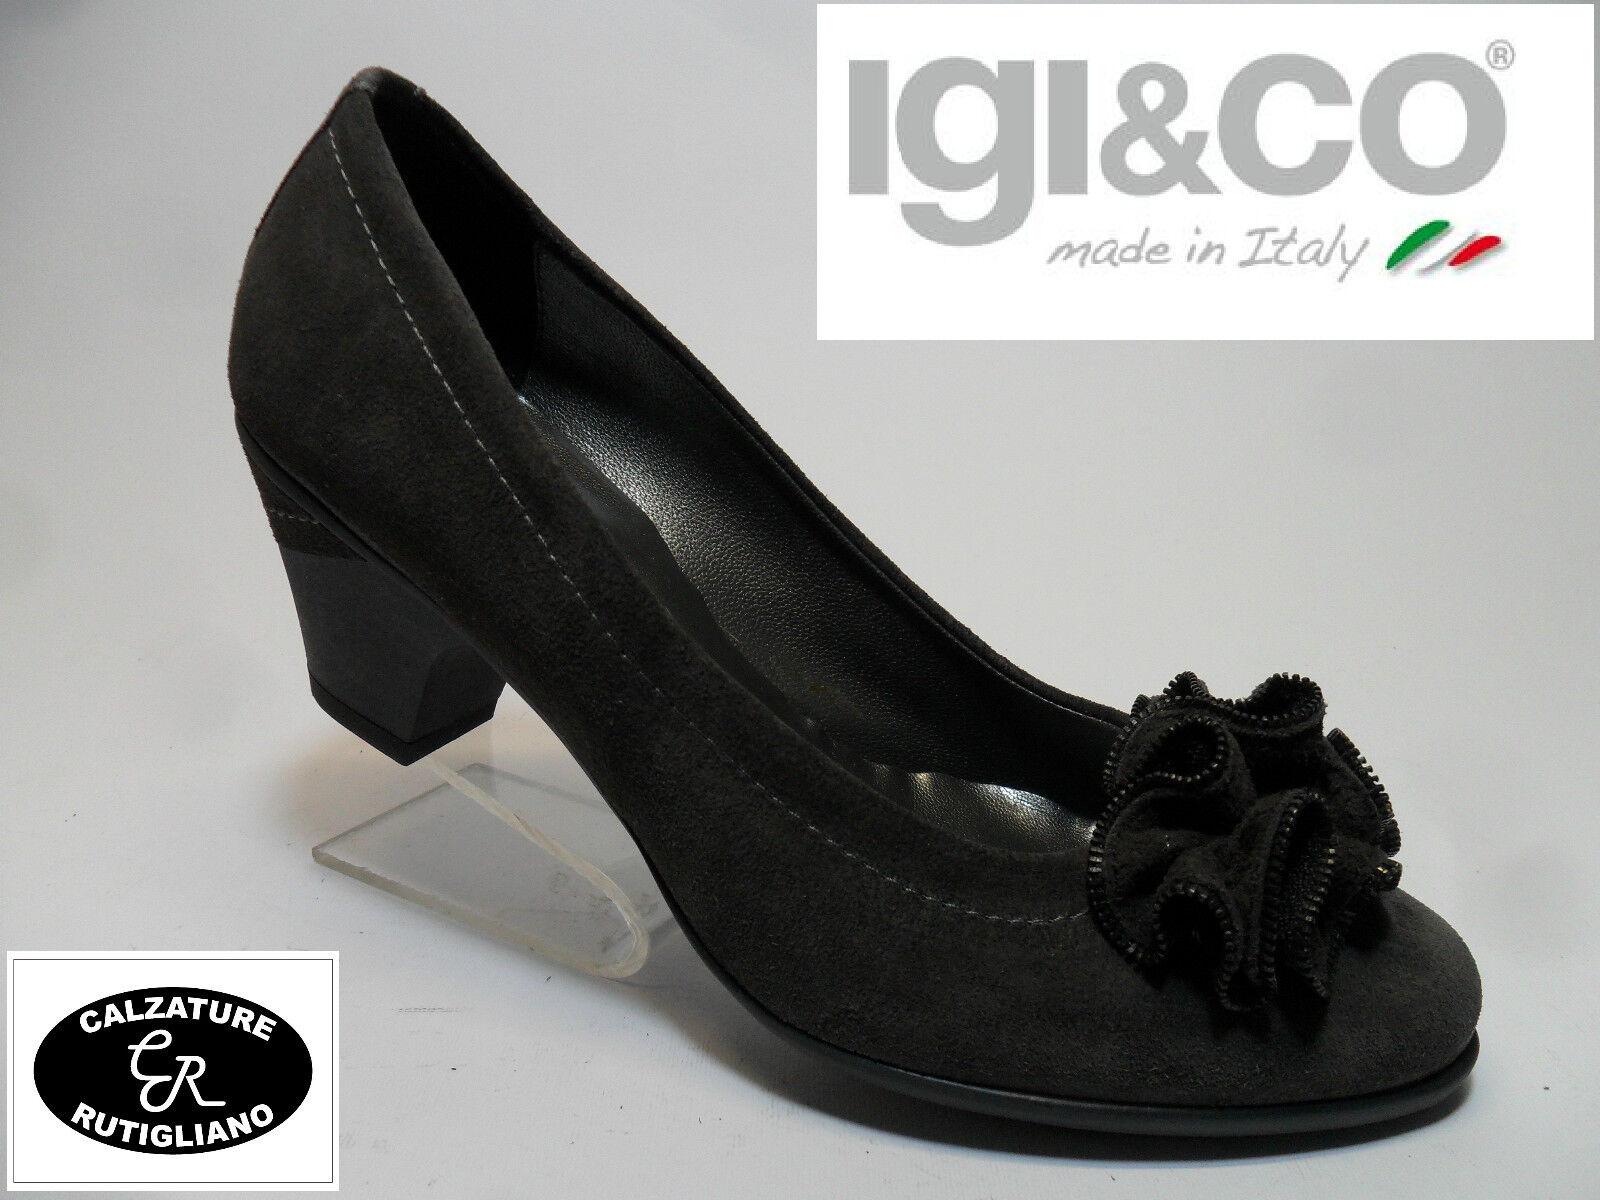 IGI & CO art.58044 SCARPE DONNA MODELLO DECOLLETE CAMOSCIO GRIGIO N.36 | Menu elegante e robusto  | Sig/Sig Ra Scarpa